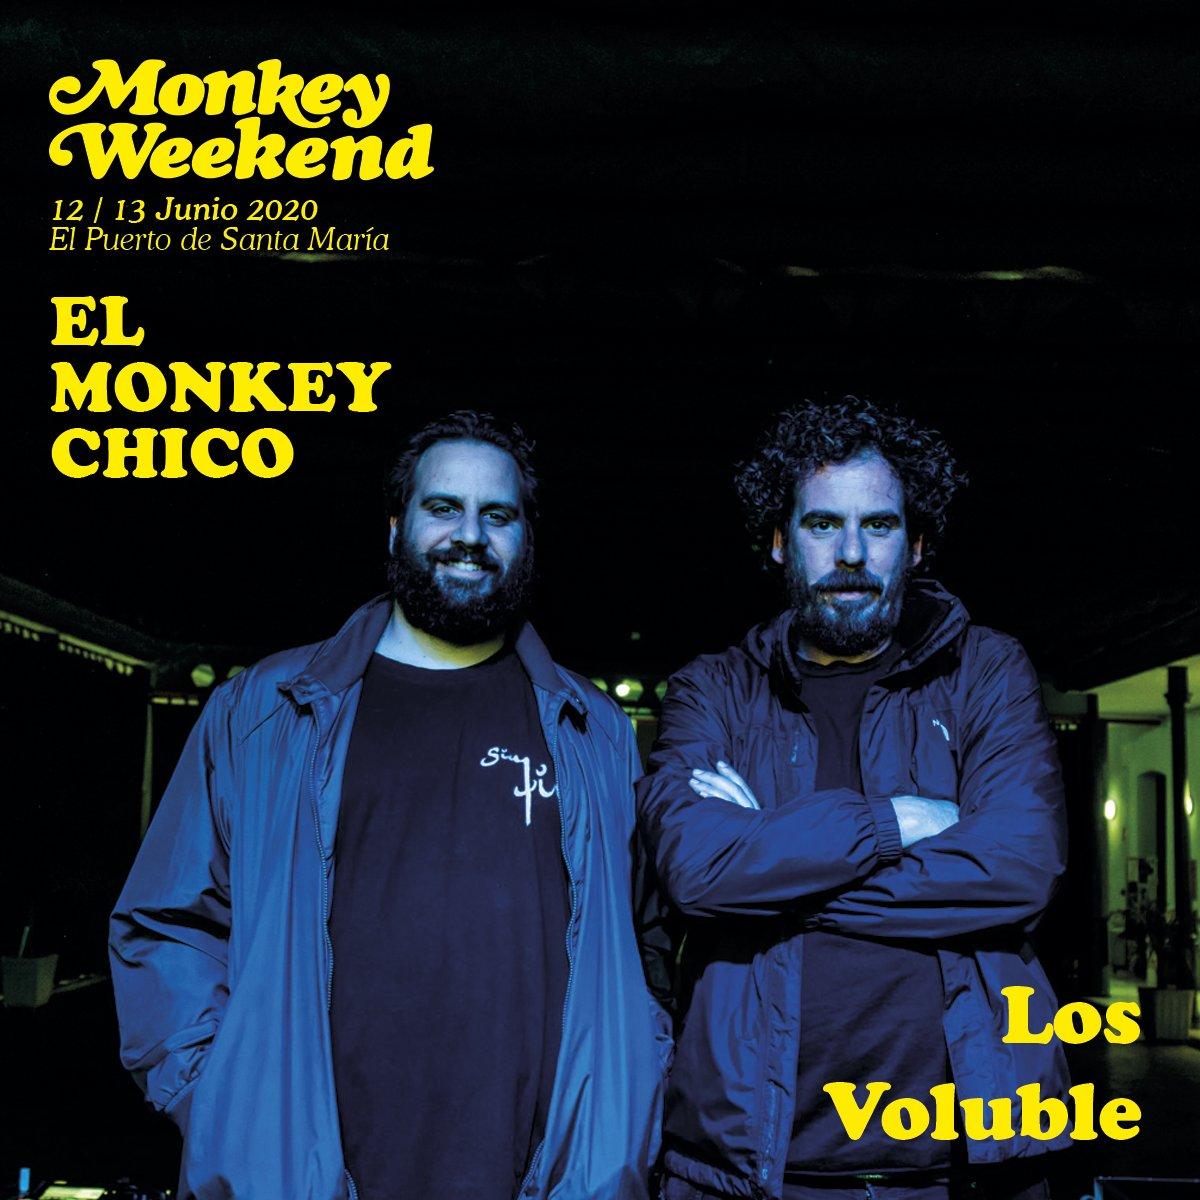 Monkeyweek photo